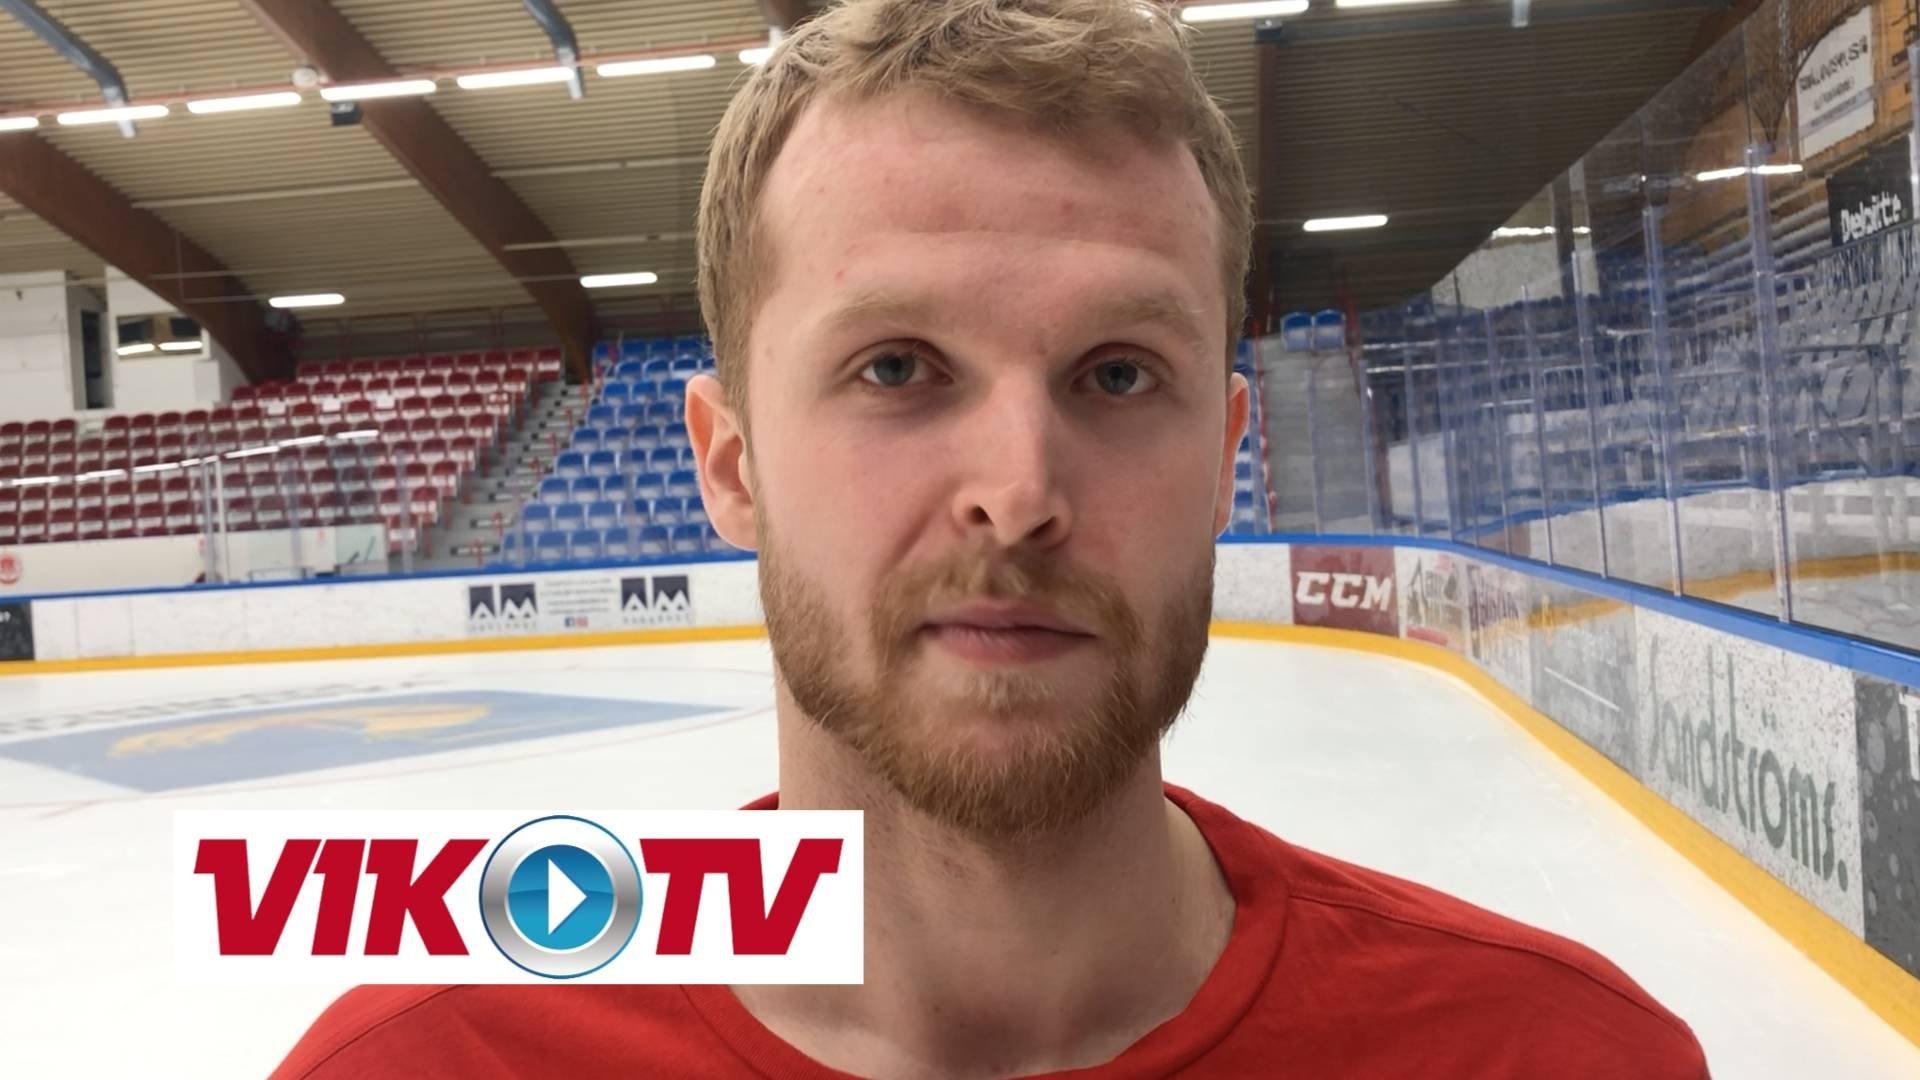 Intervju med Daniel Marmenlind efter semifinal 6